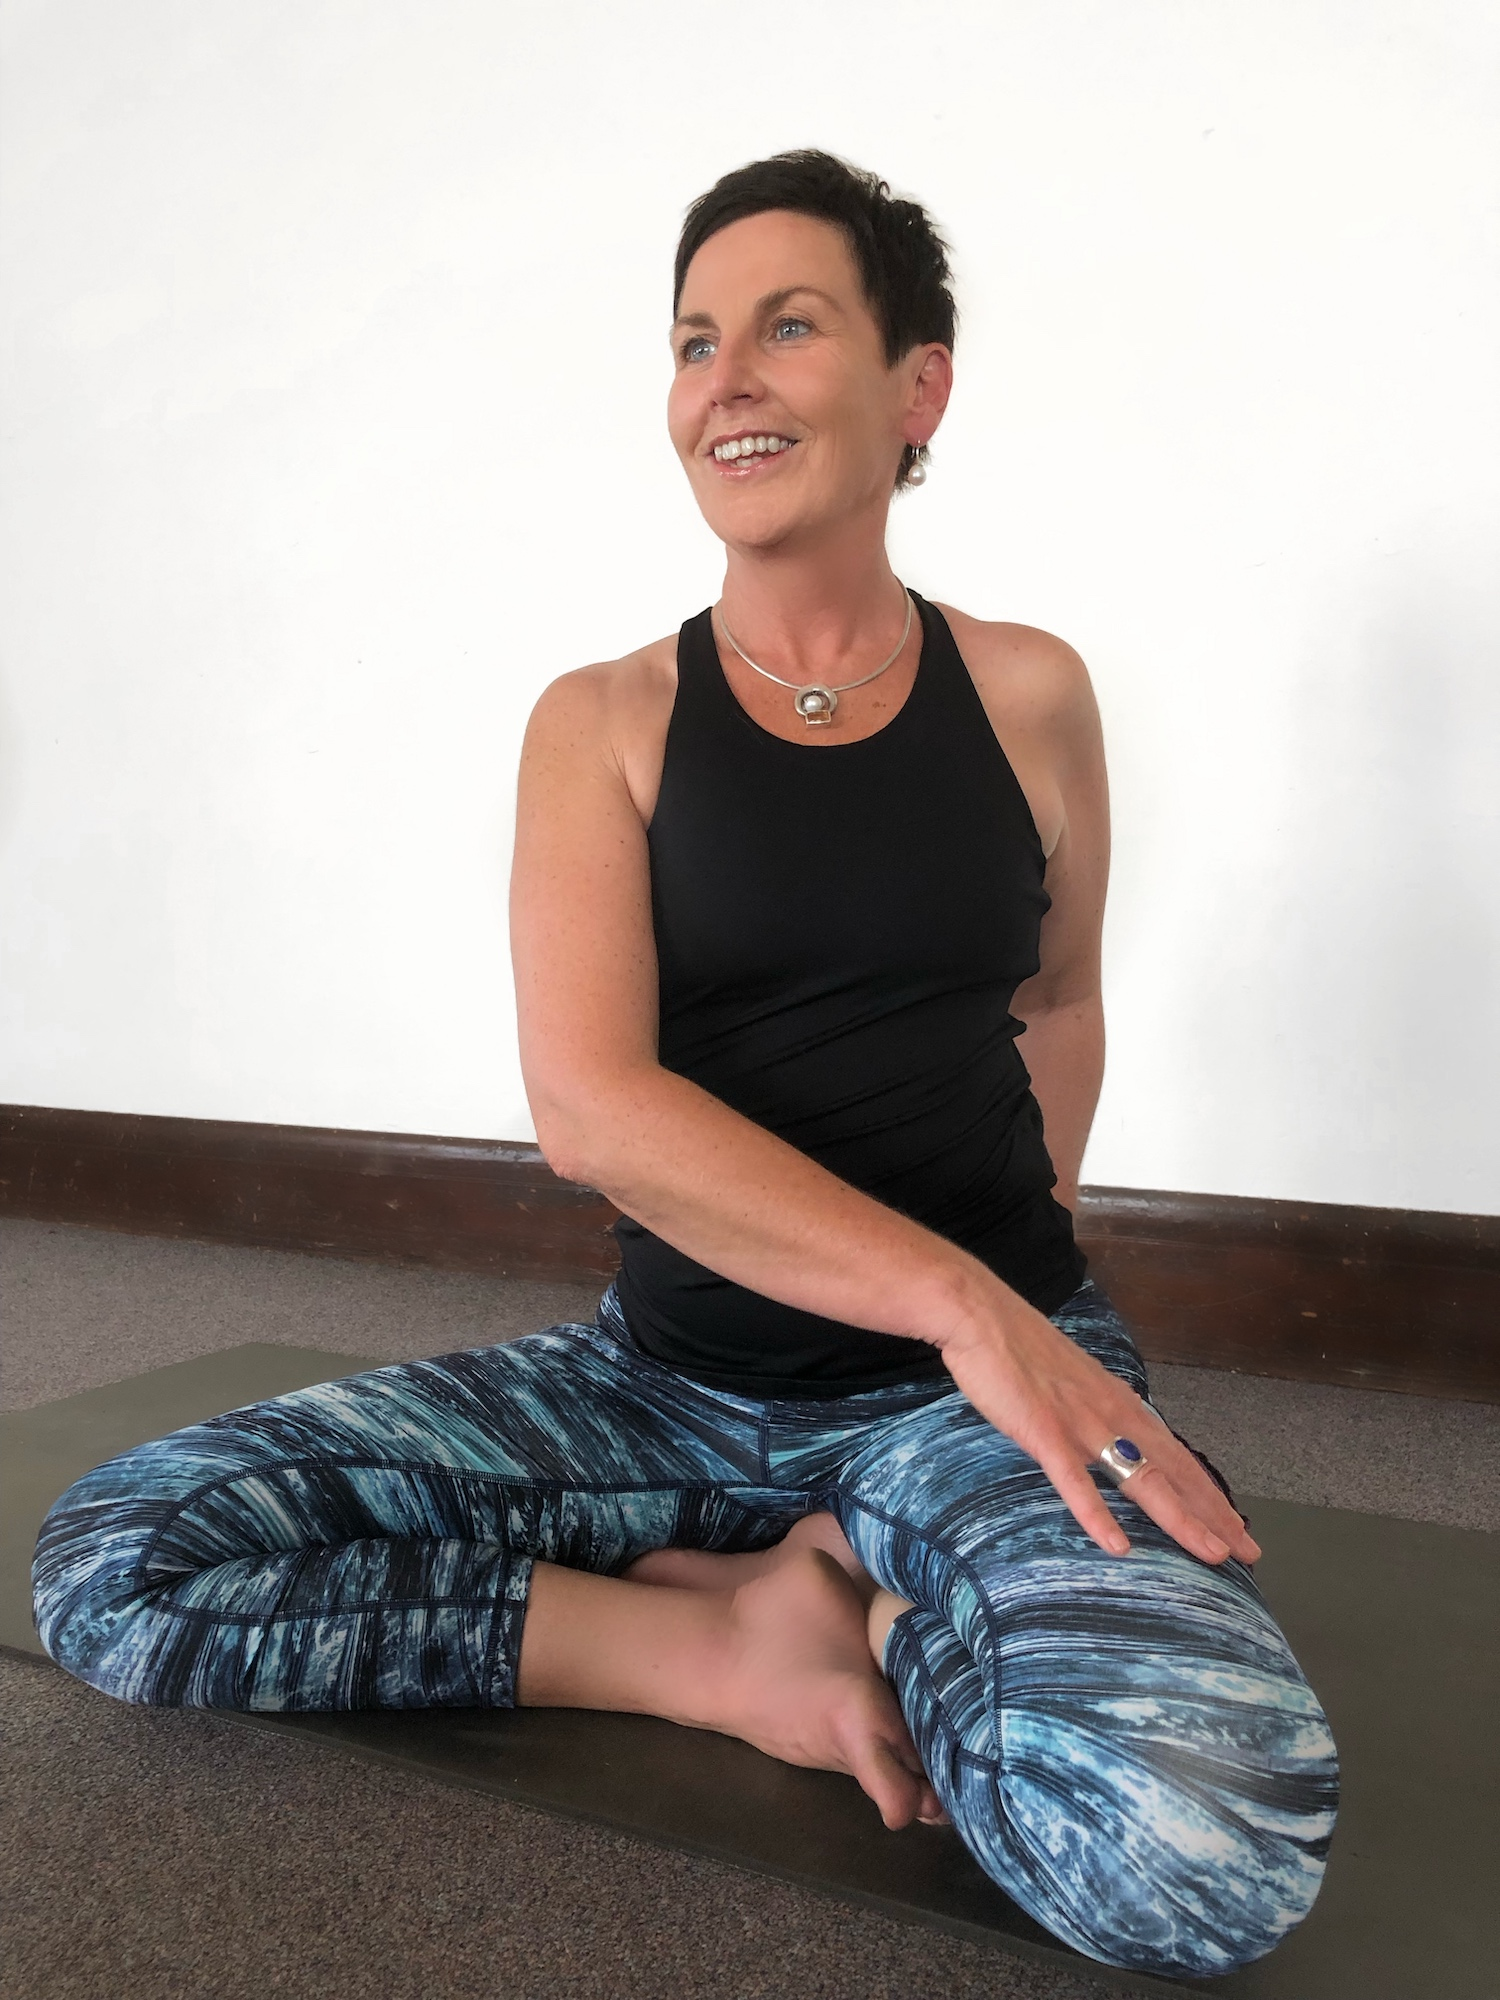 Robyn doing yoga pose